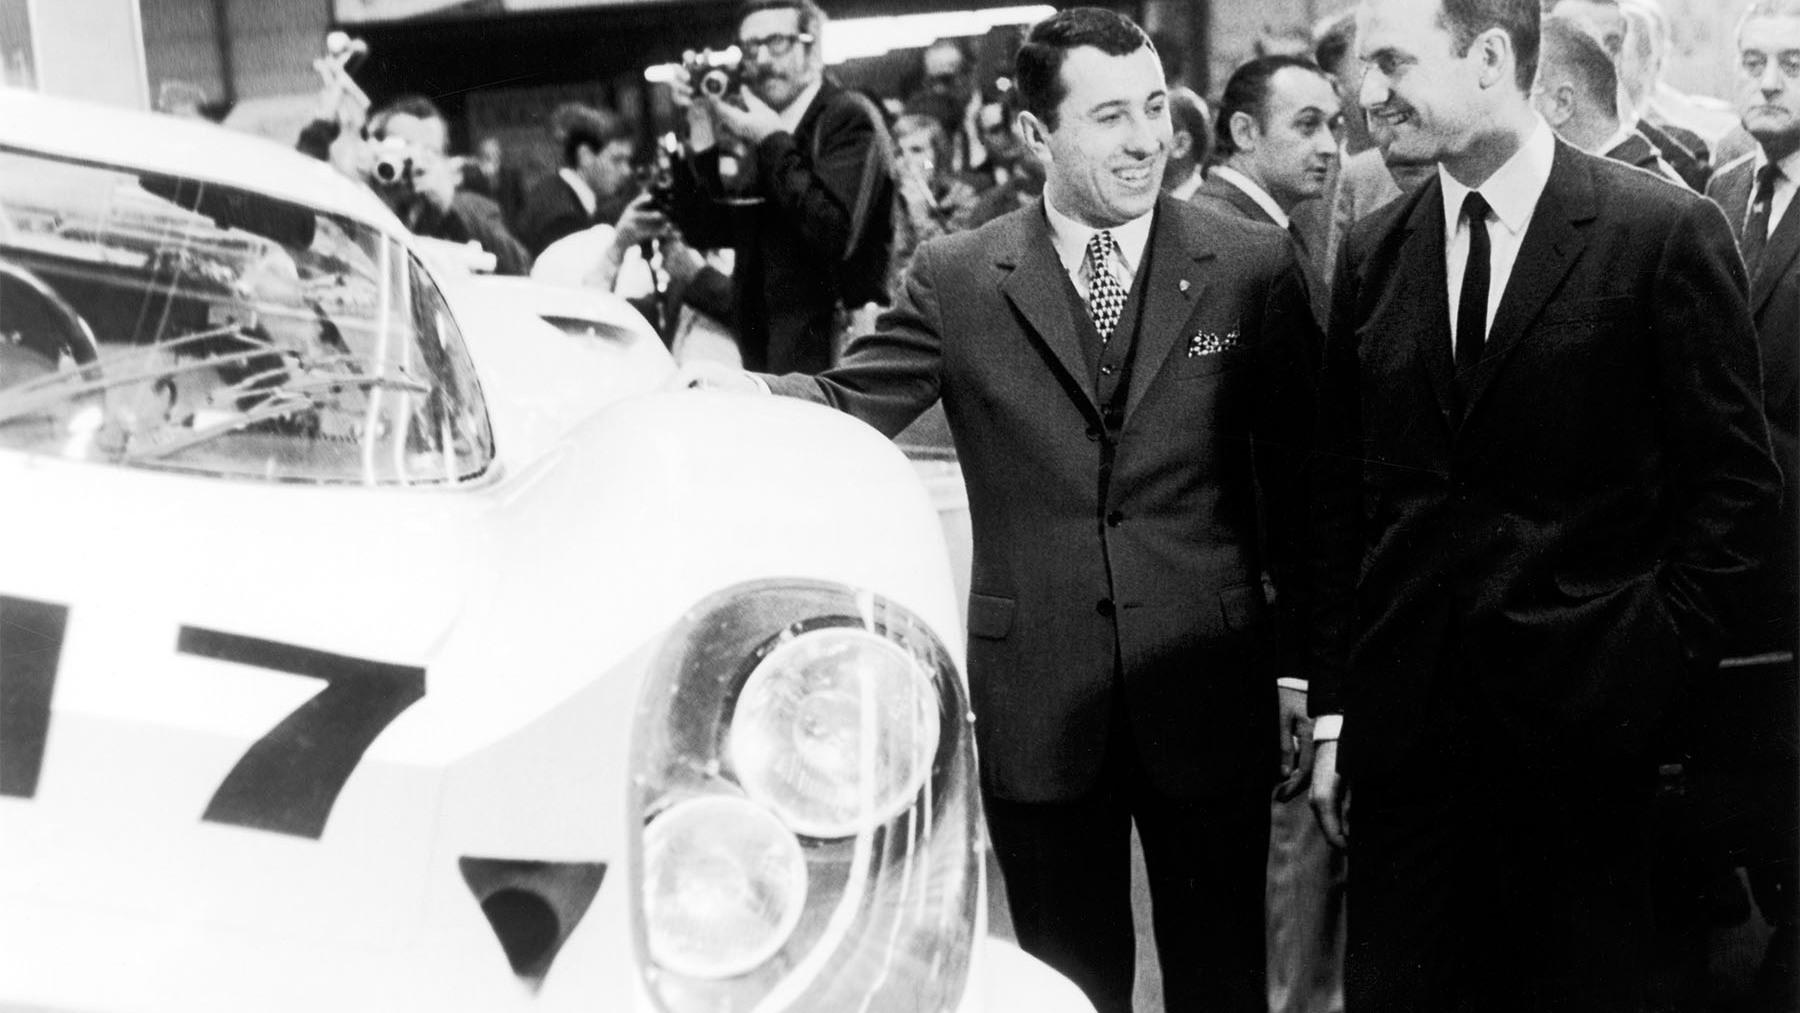 porsche 917 race car 007